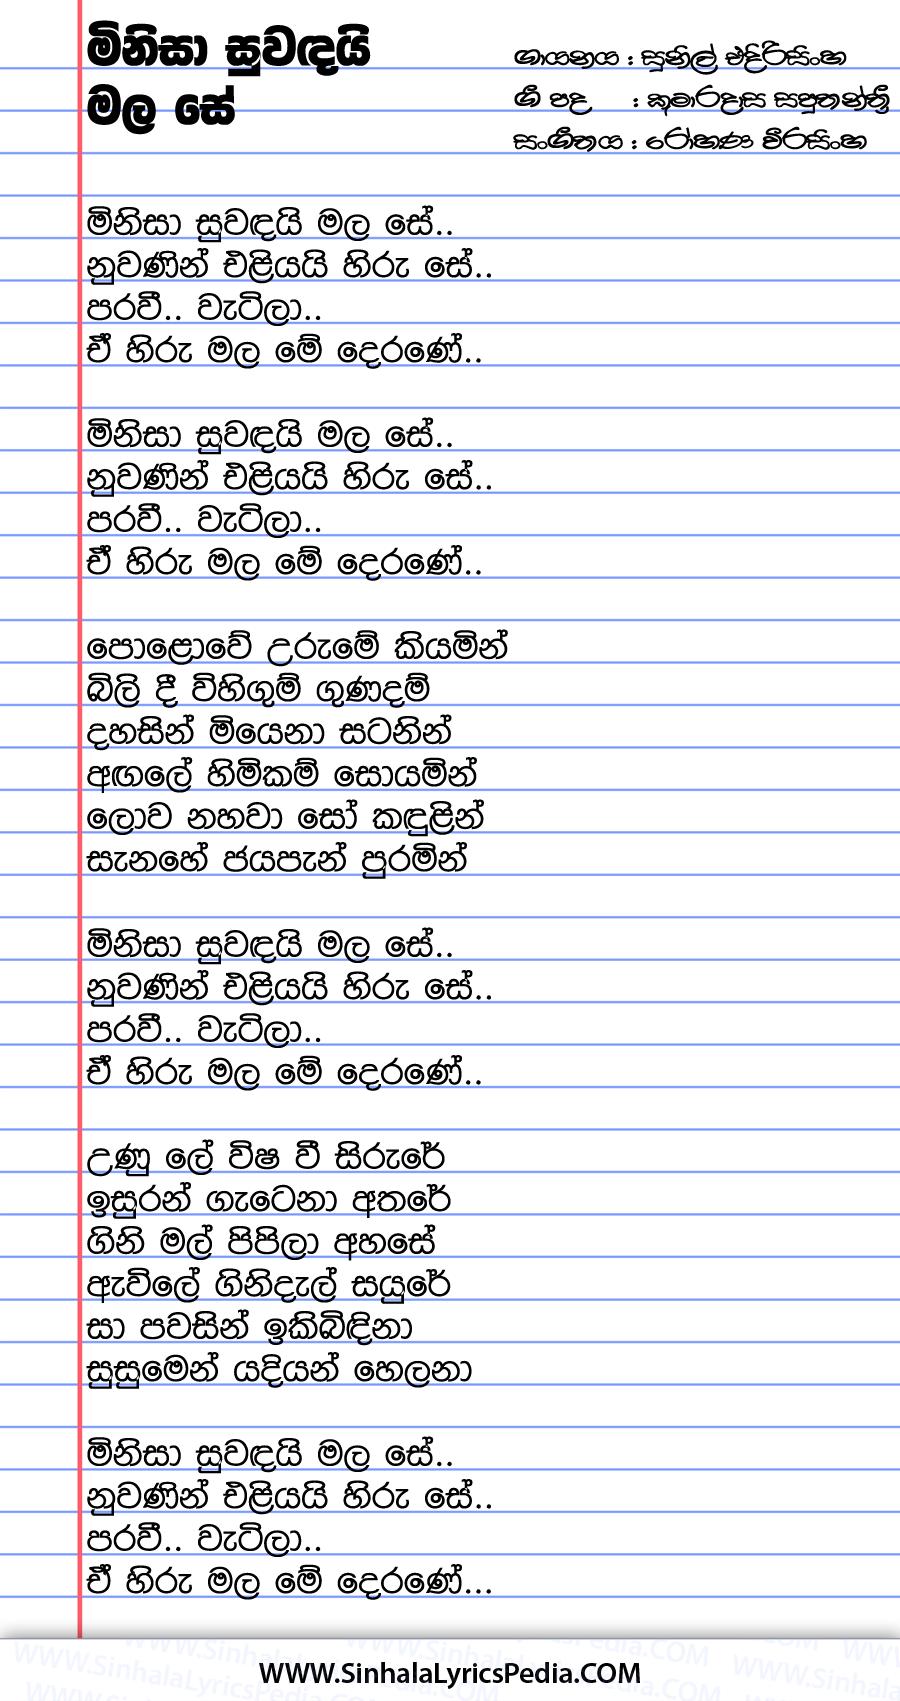 Minisa Suwadai Mala Se Song Lyrics